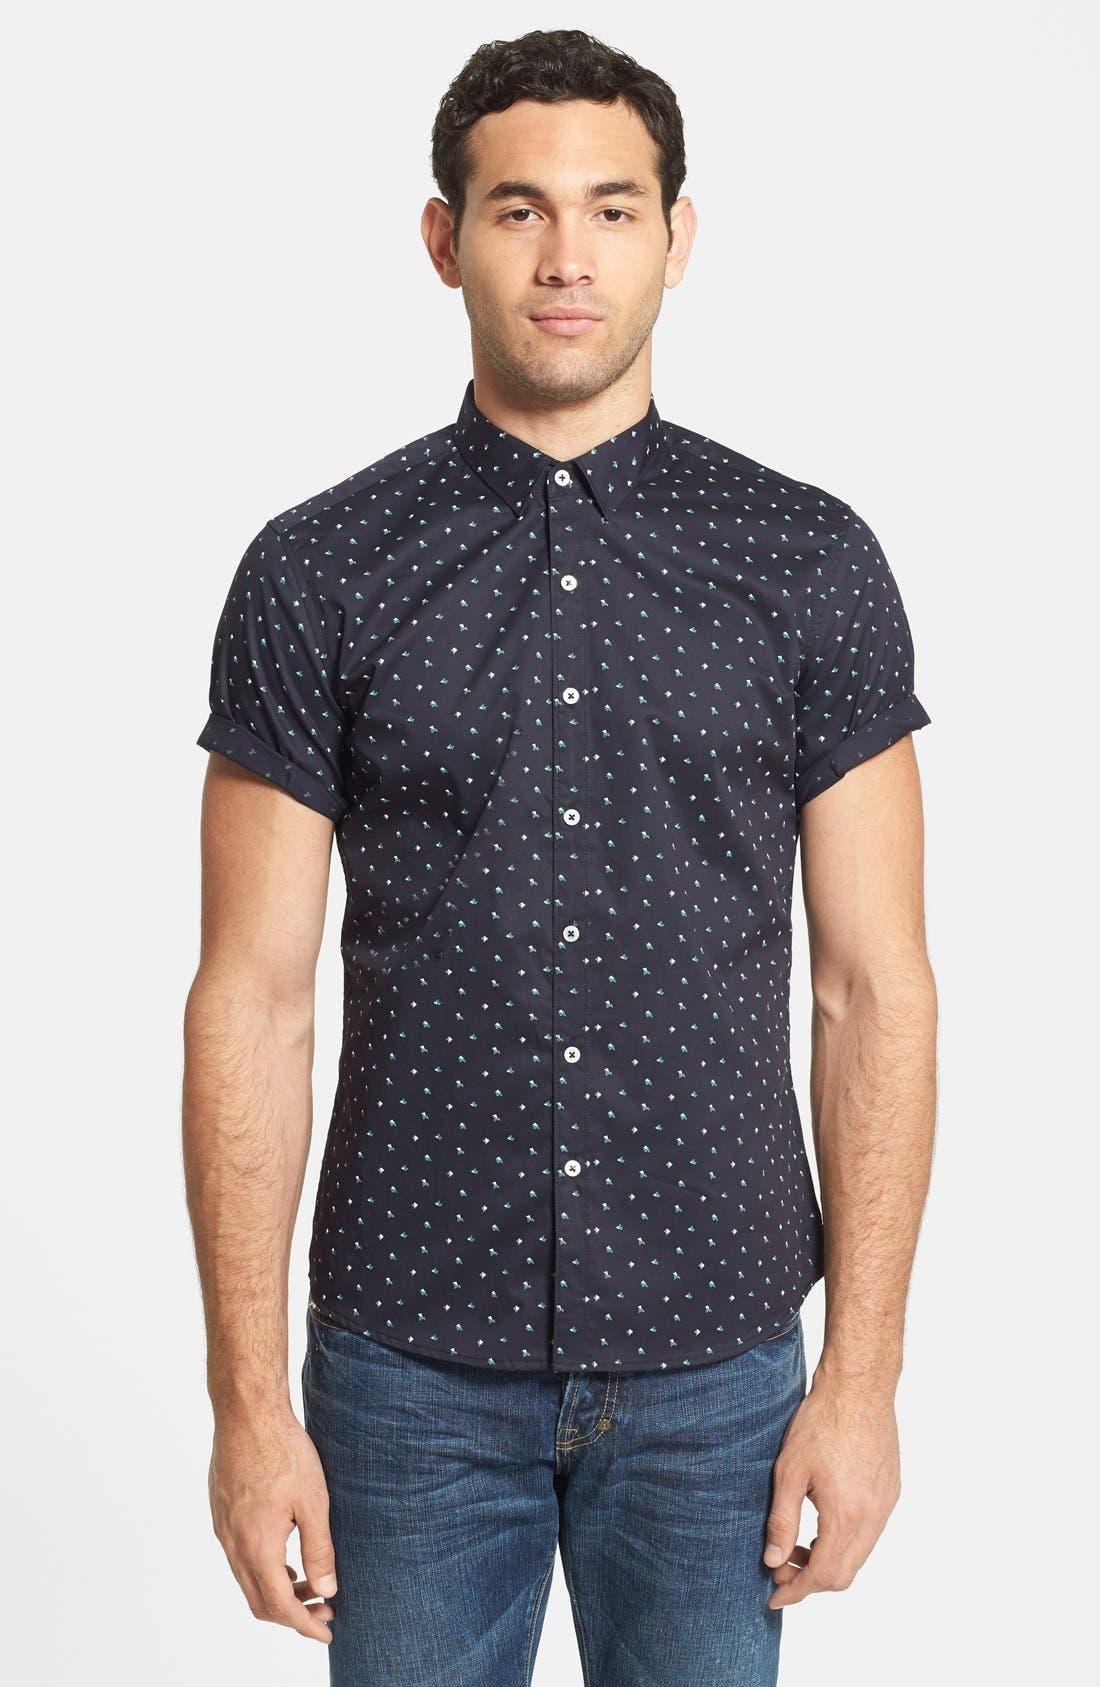 7 DIAMONDS 'Positive Mind' Short Sleeve Sport Shirt, Main, color, 410